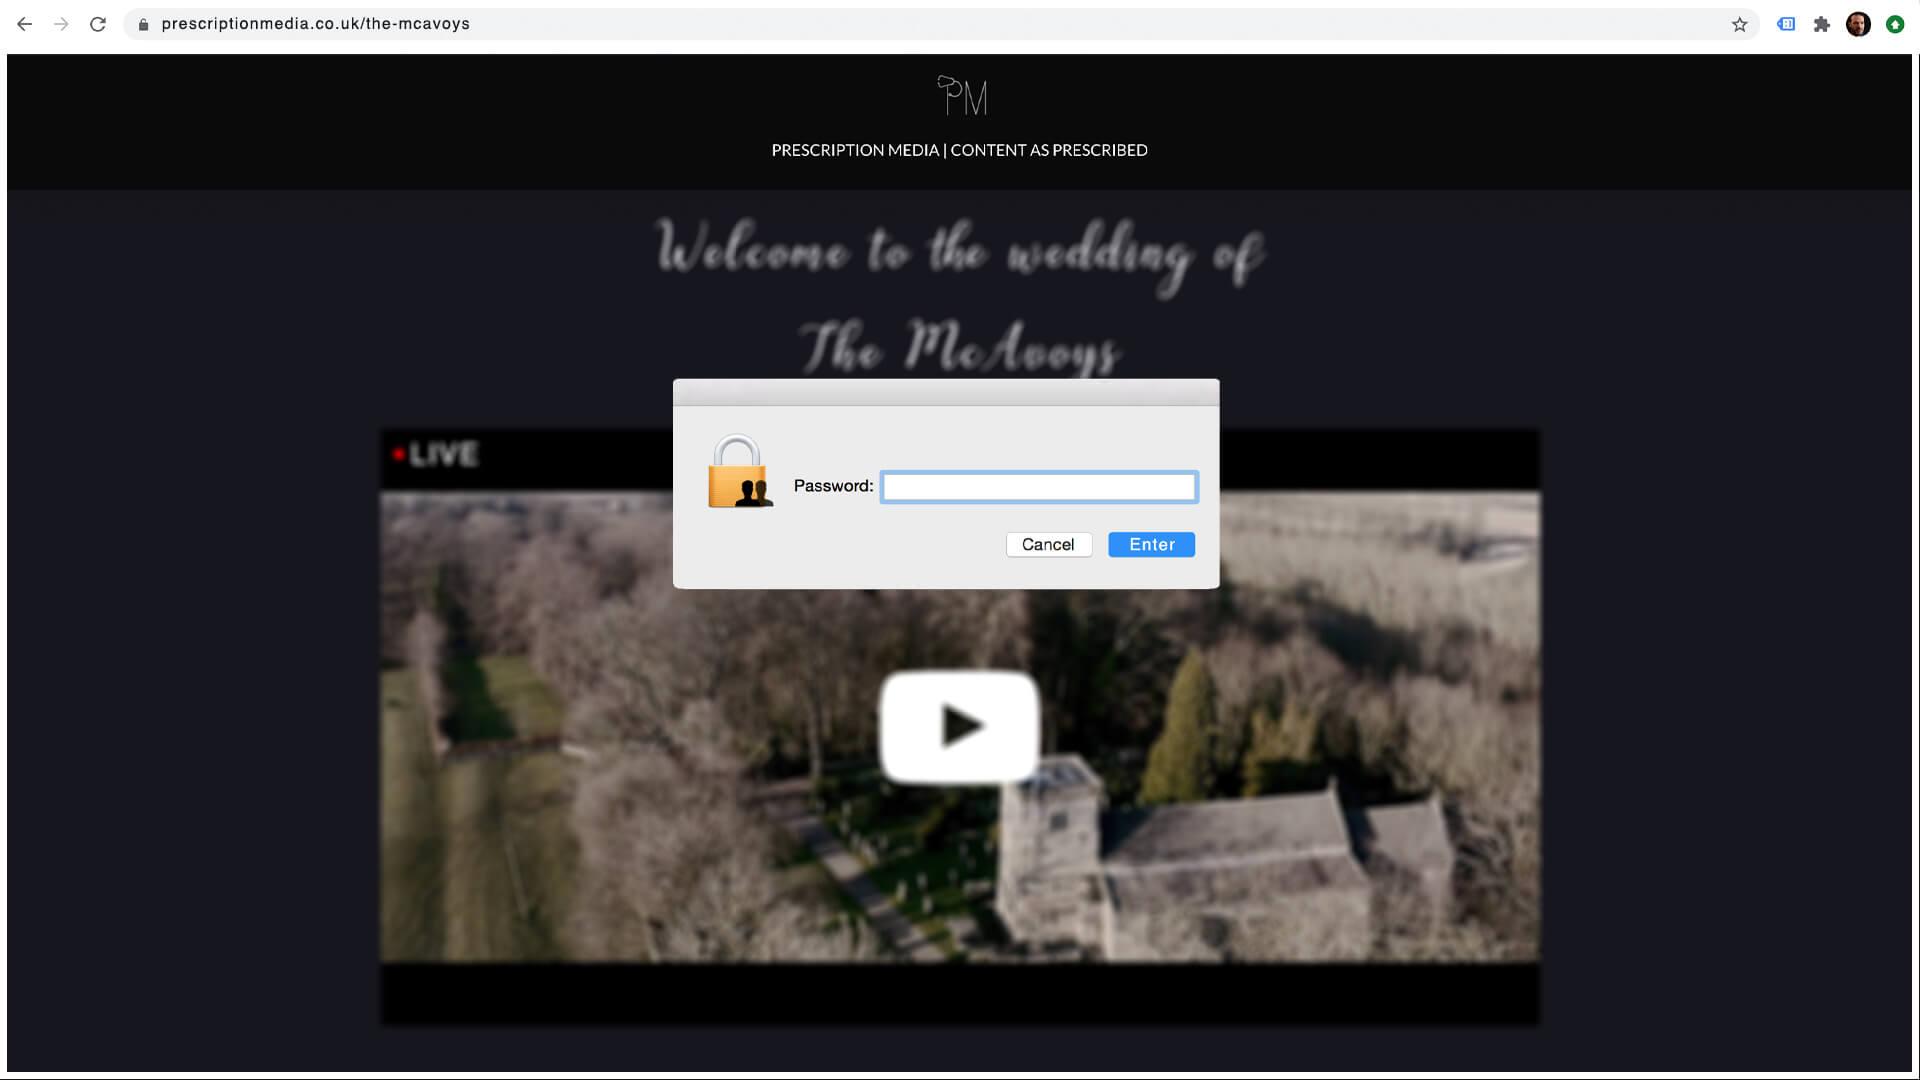 wedding live stream bespoke webpage by prescription media